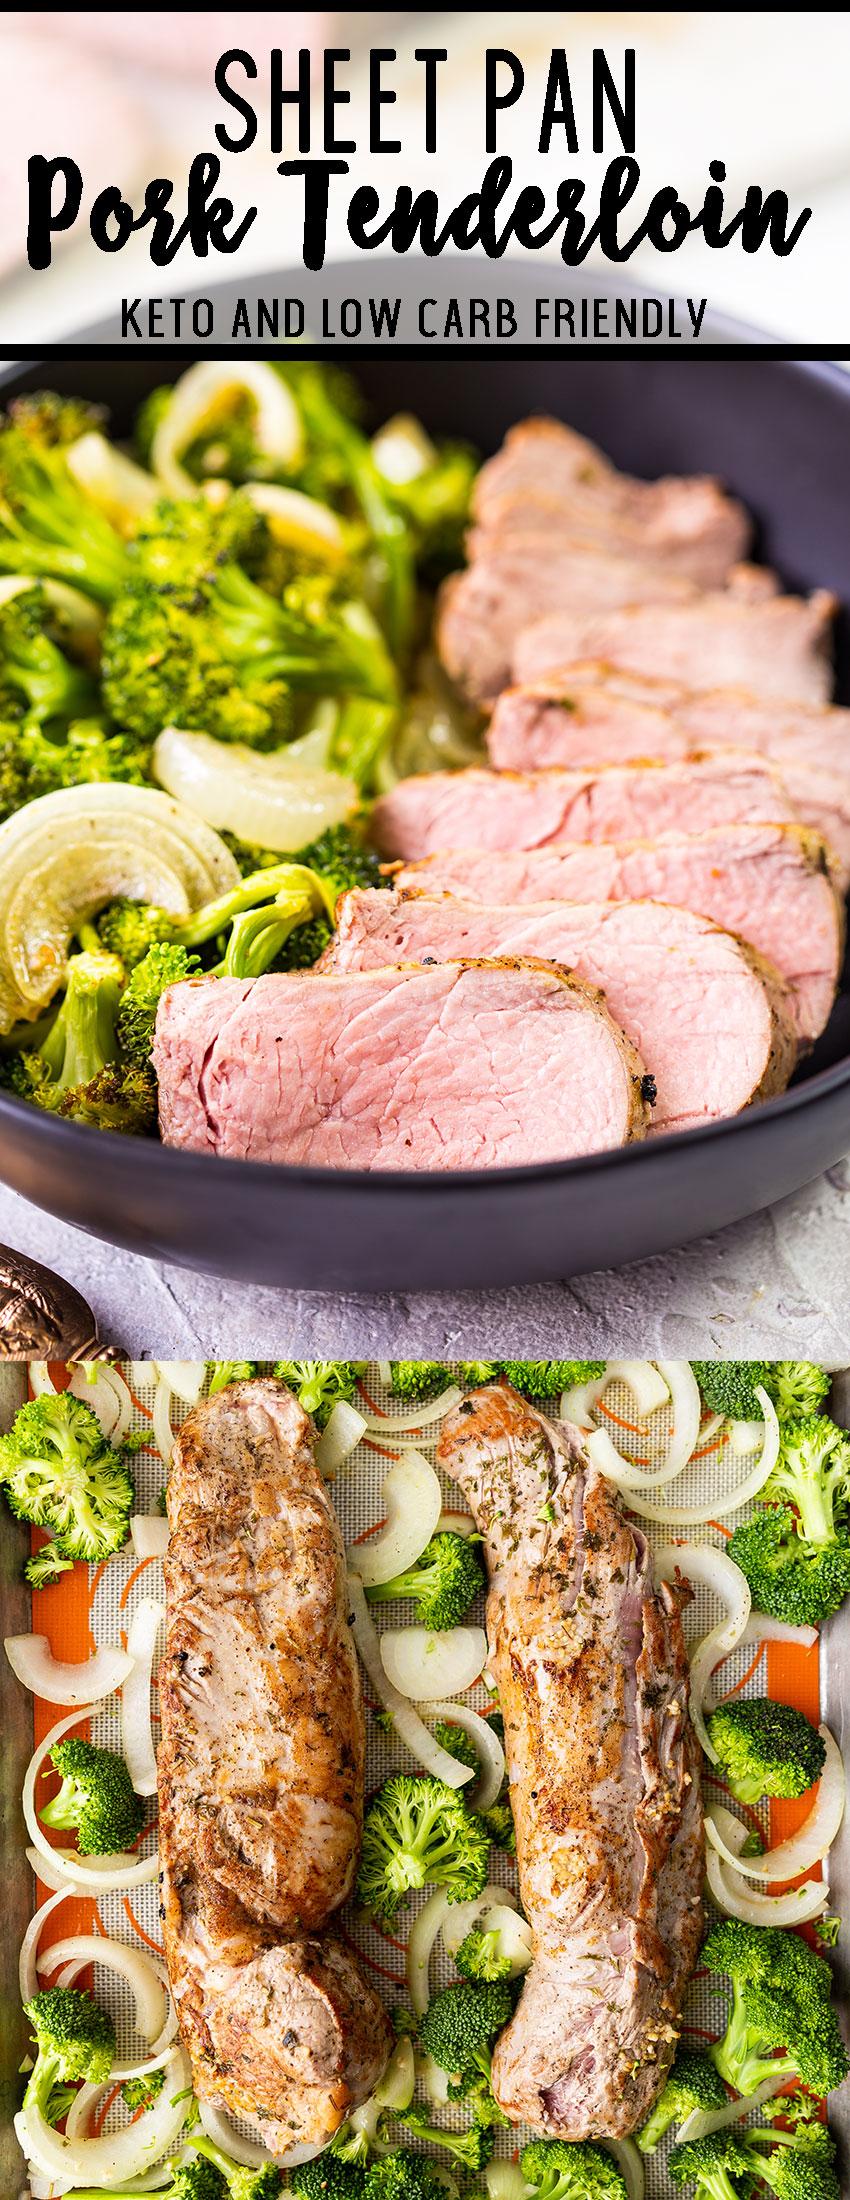 Sheet pan pork tenderloin with vegetables